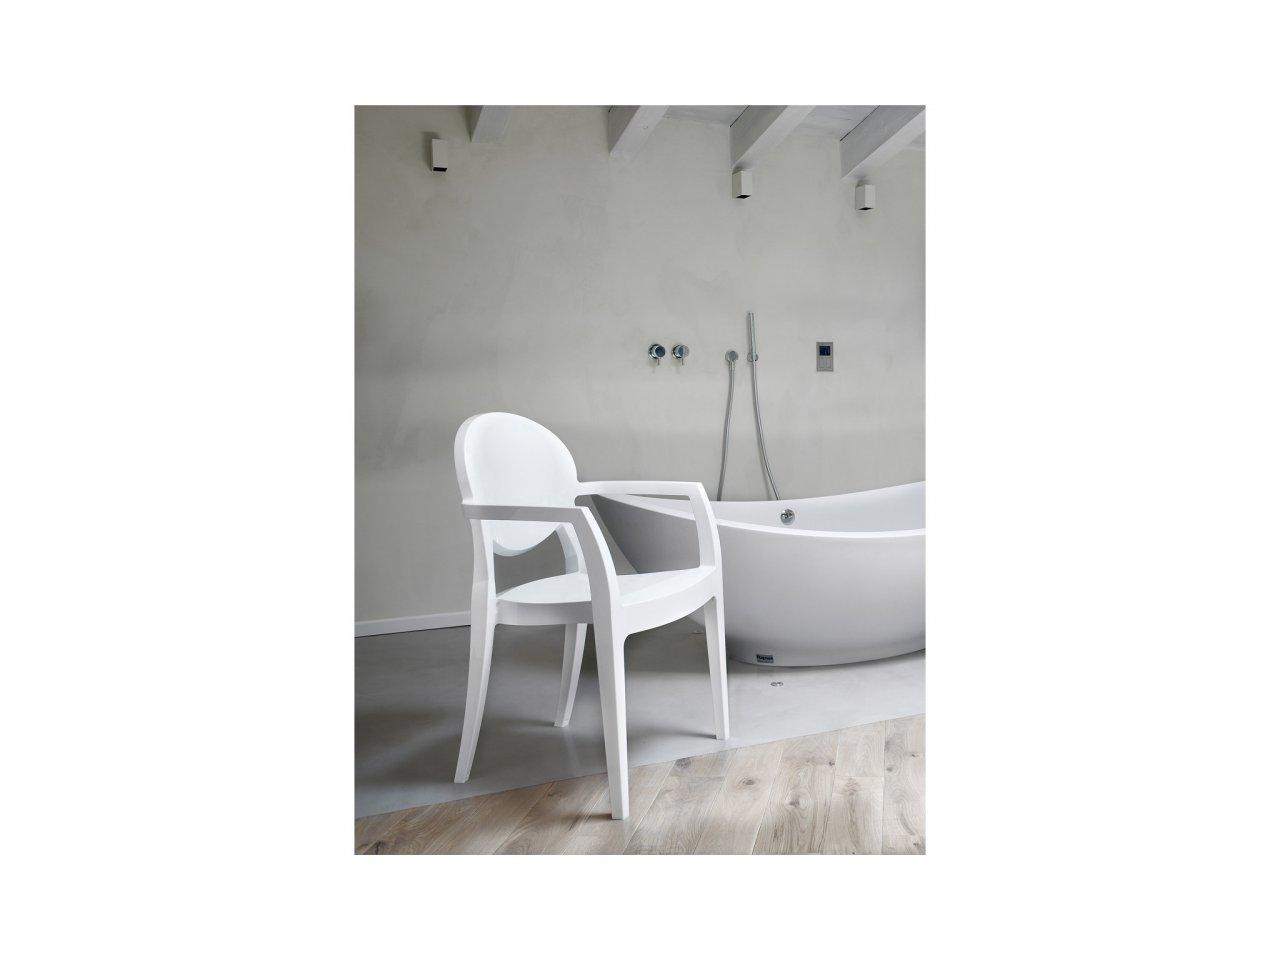 Sedia Con Braccioli Igloo Tecnopolimero - v11